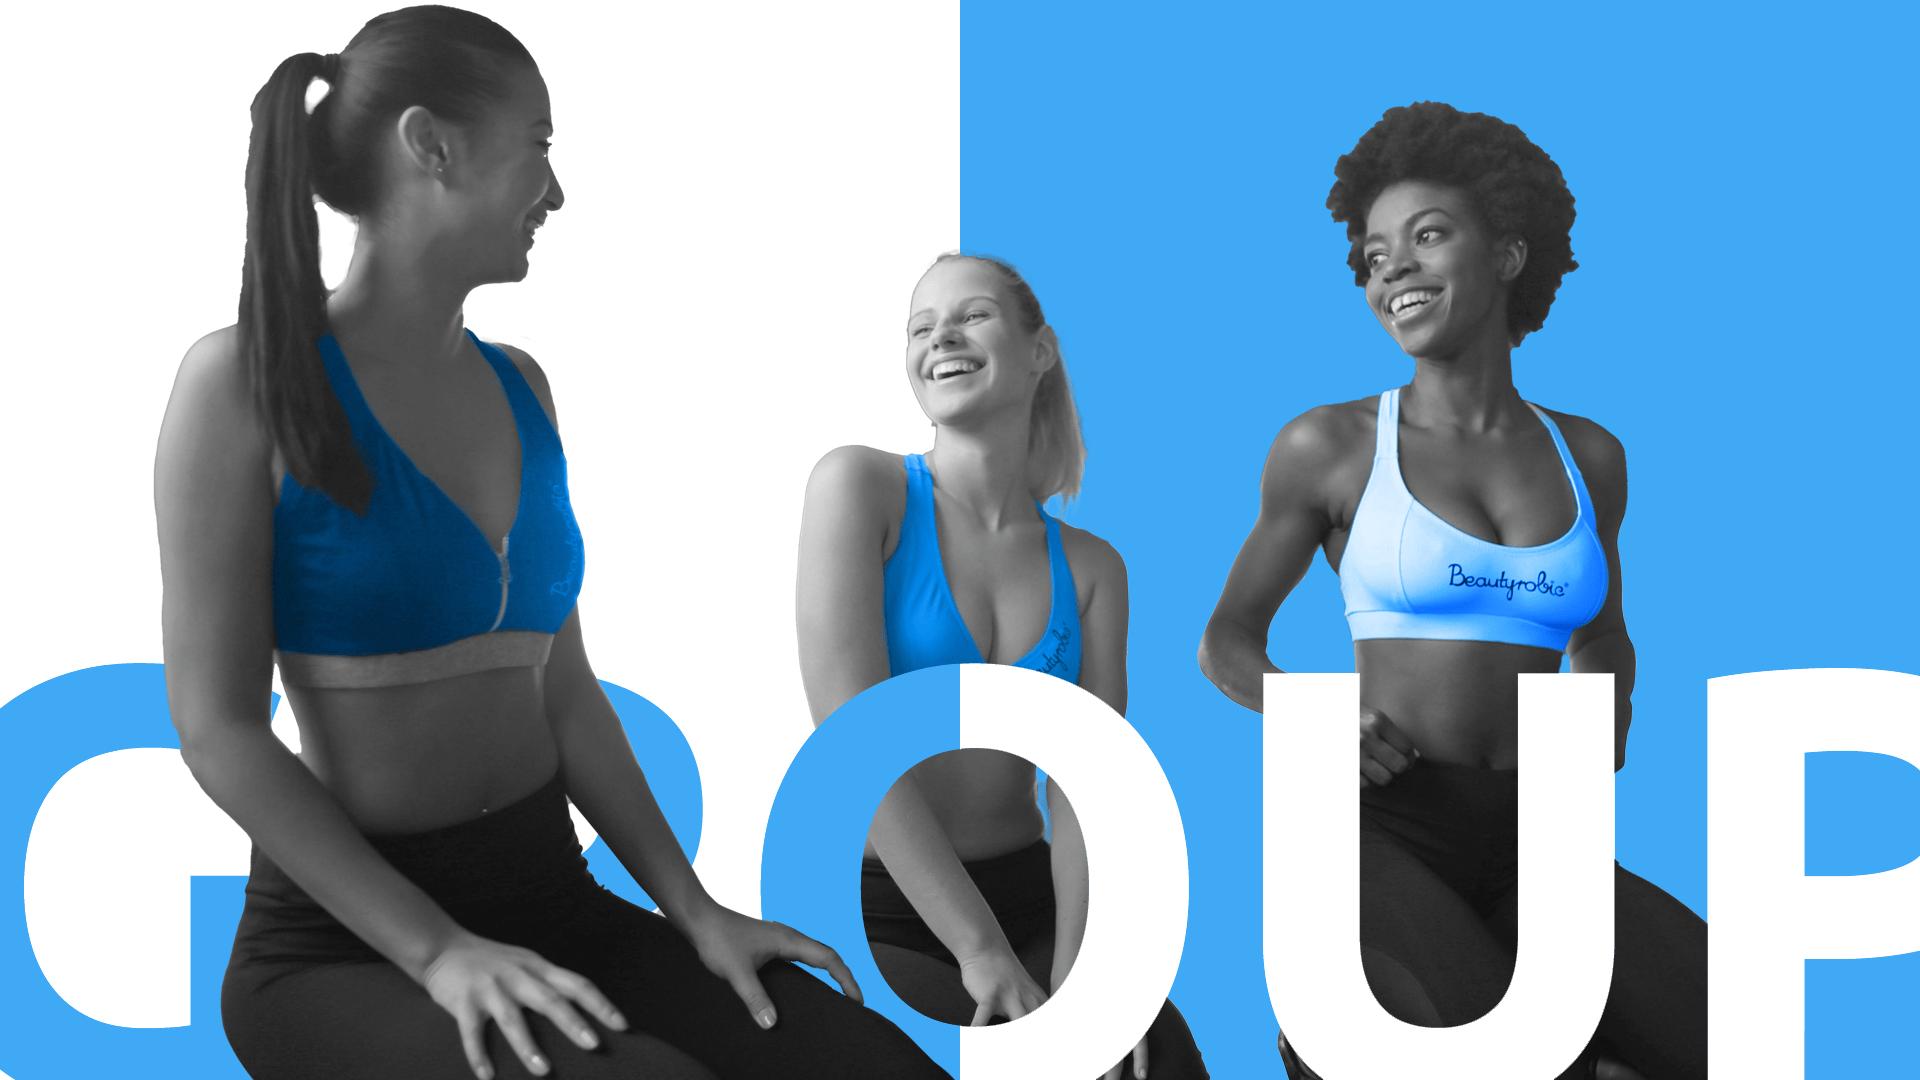 Gruppentraining - Group Fitness bei Bi PHiT